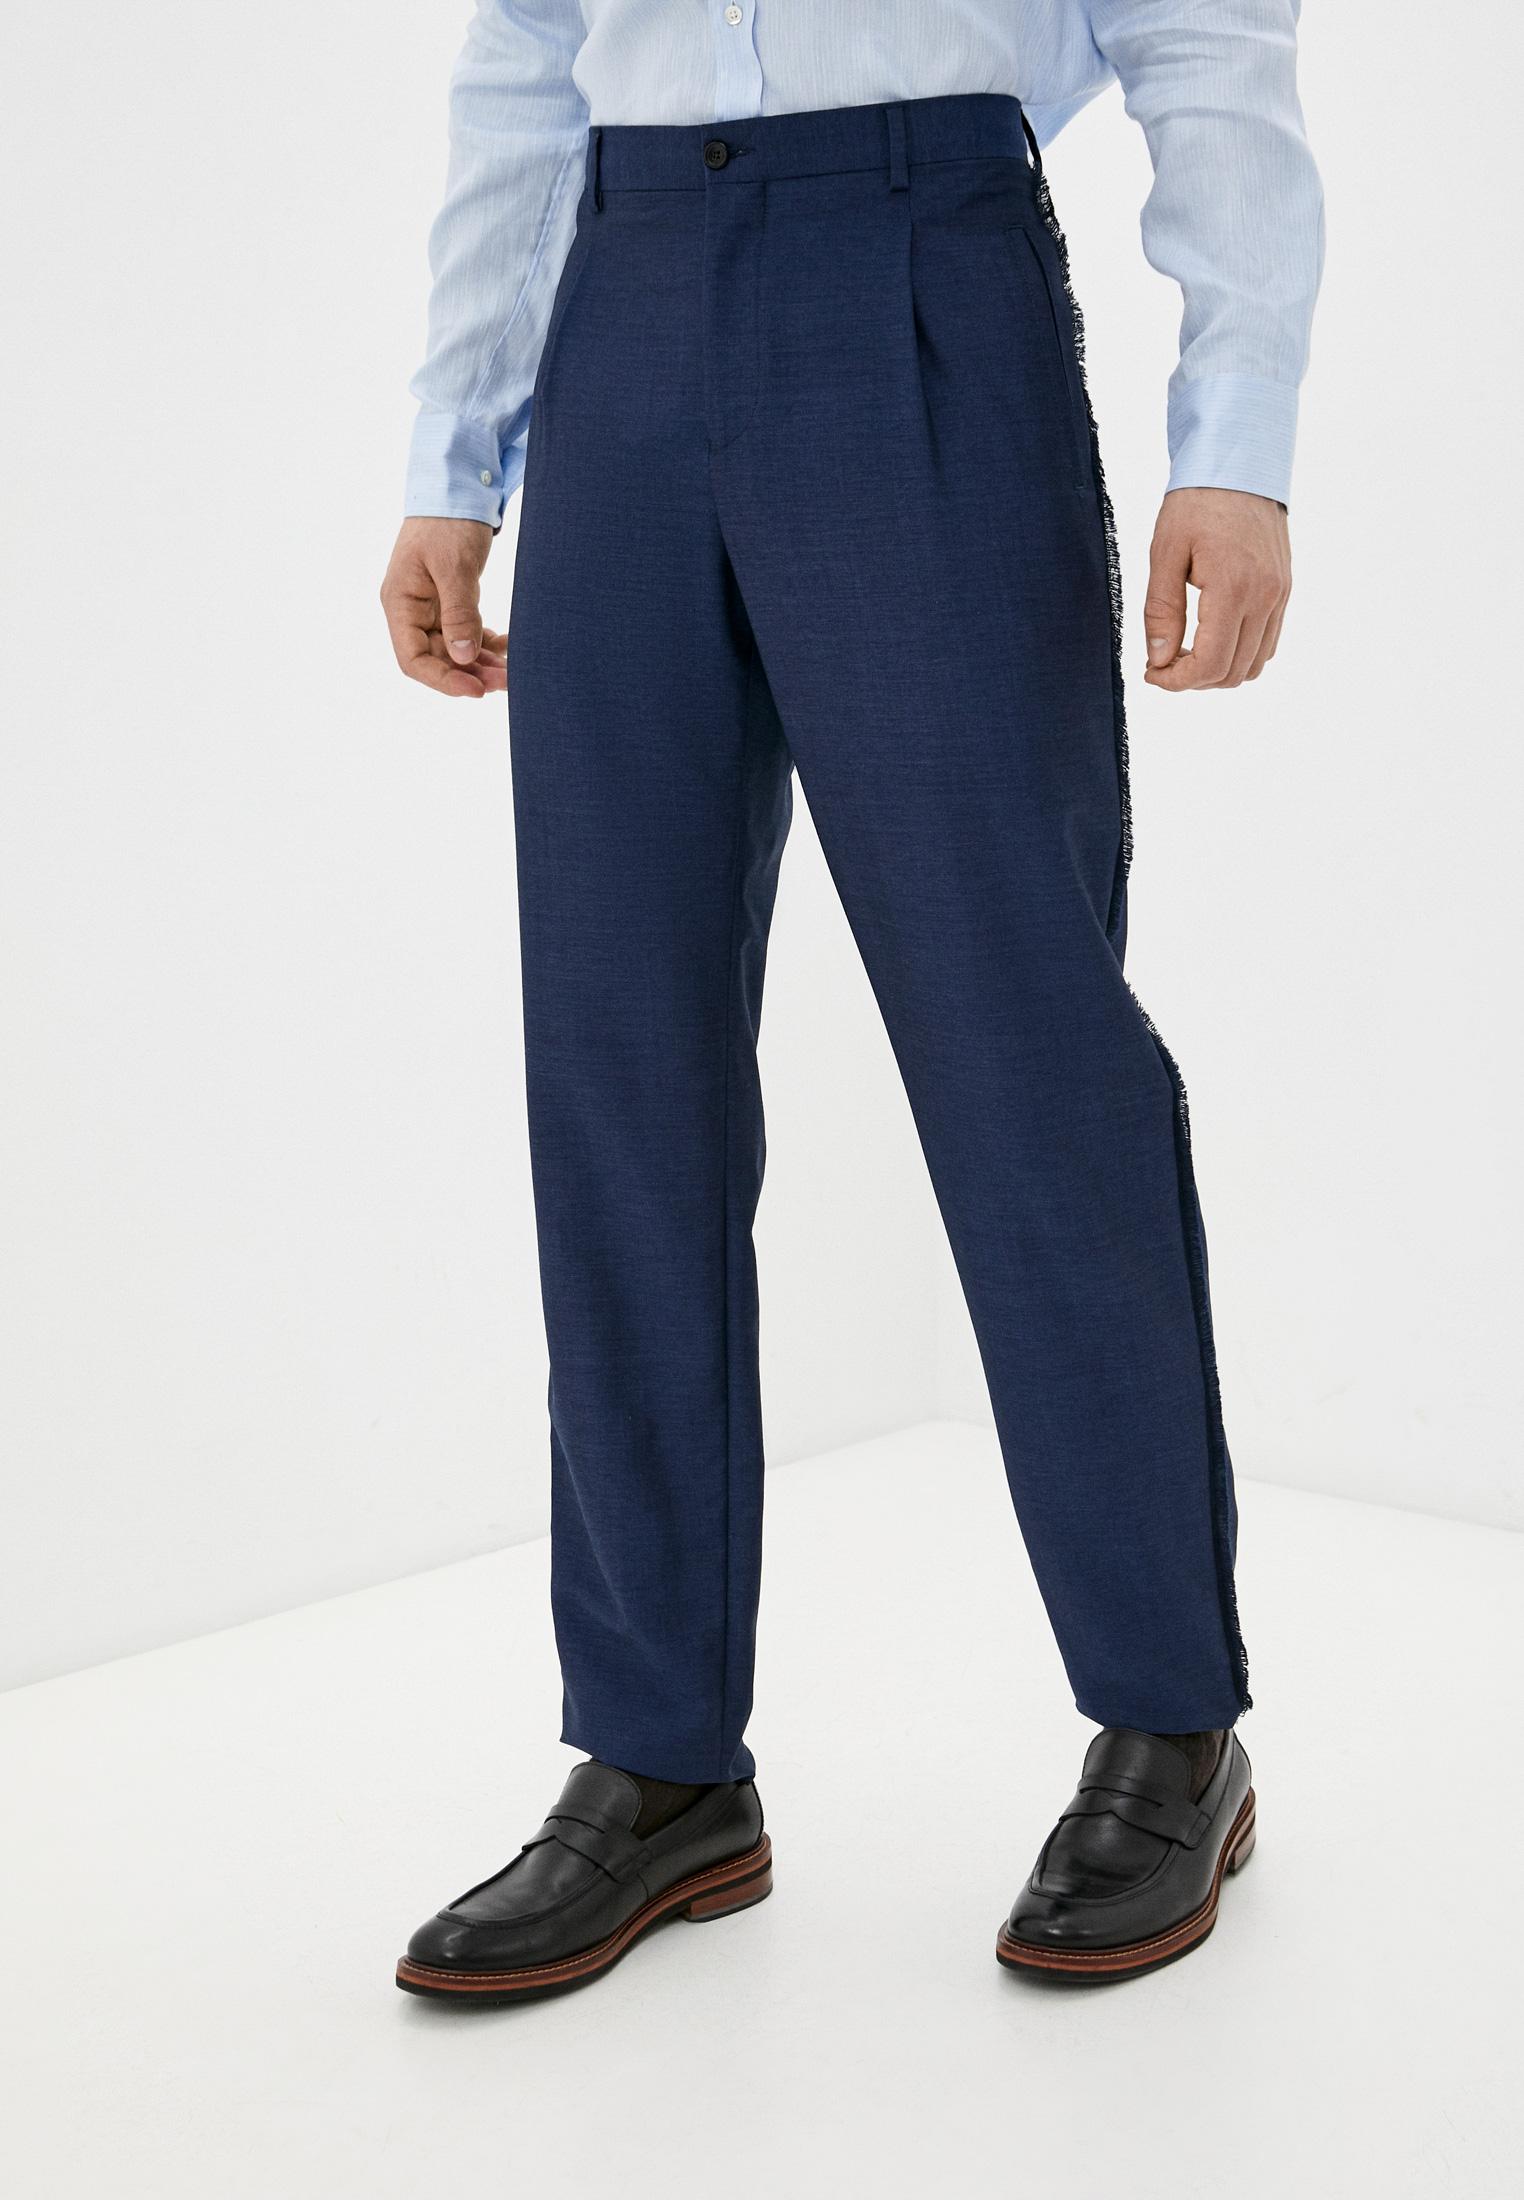 Мужские классические брюки Emporio Armani (Эмпорио Армани) W1P210 W1032